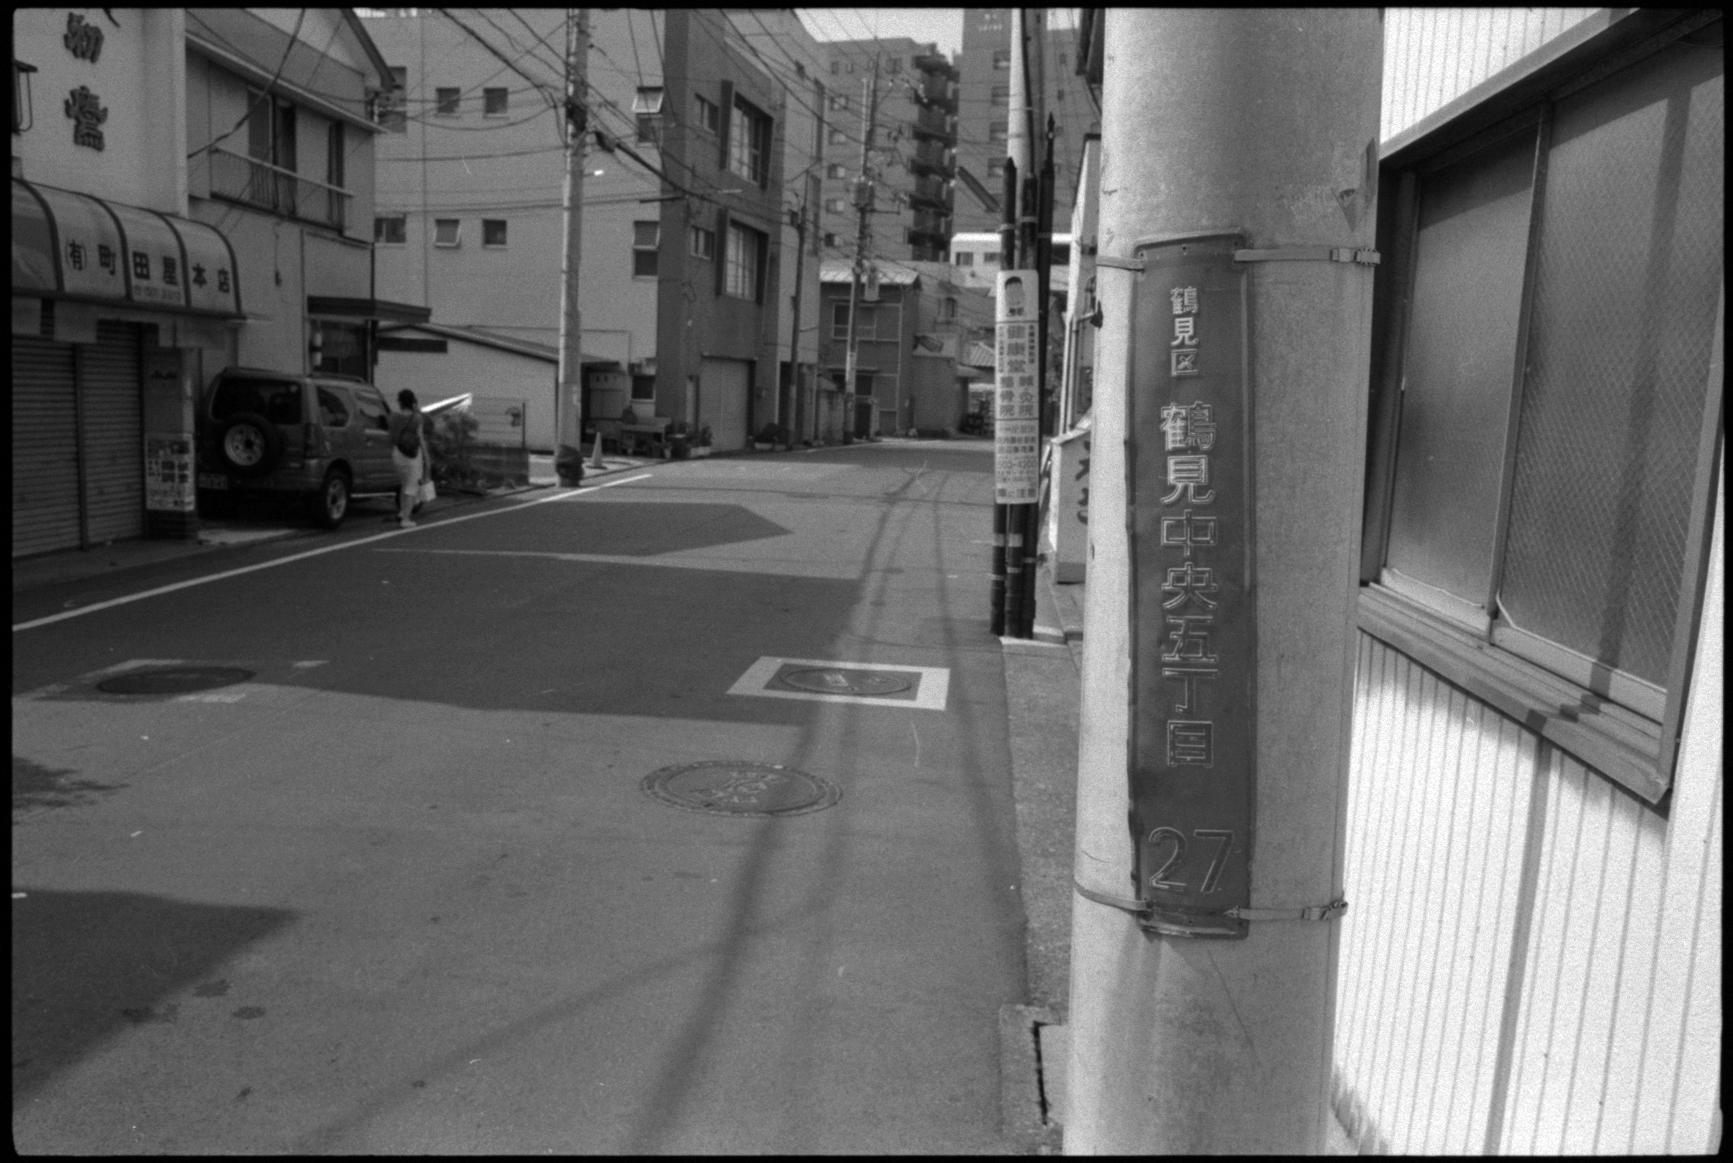 20140619 LeicaM4-P Elmarit28 400TX TMD 044